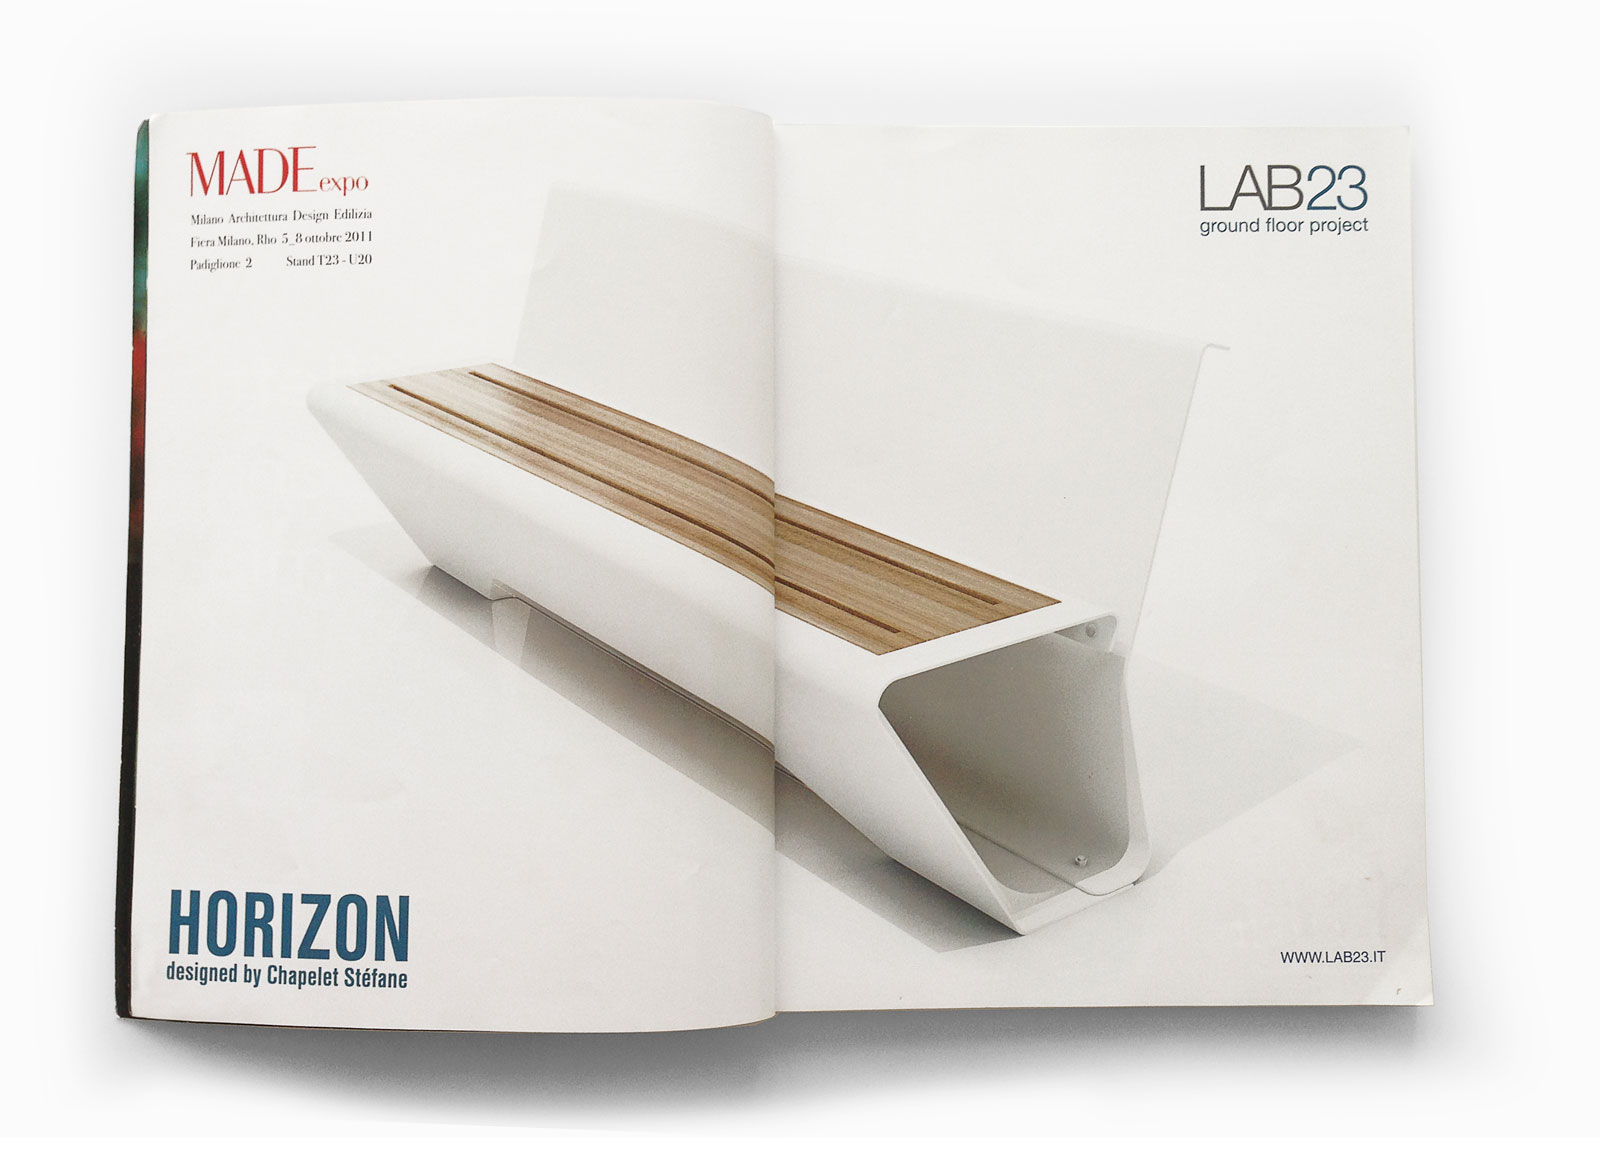 HoriZon bench by Stephane Chapelet